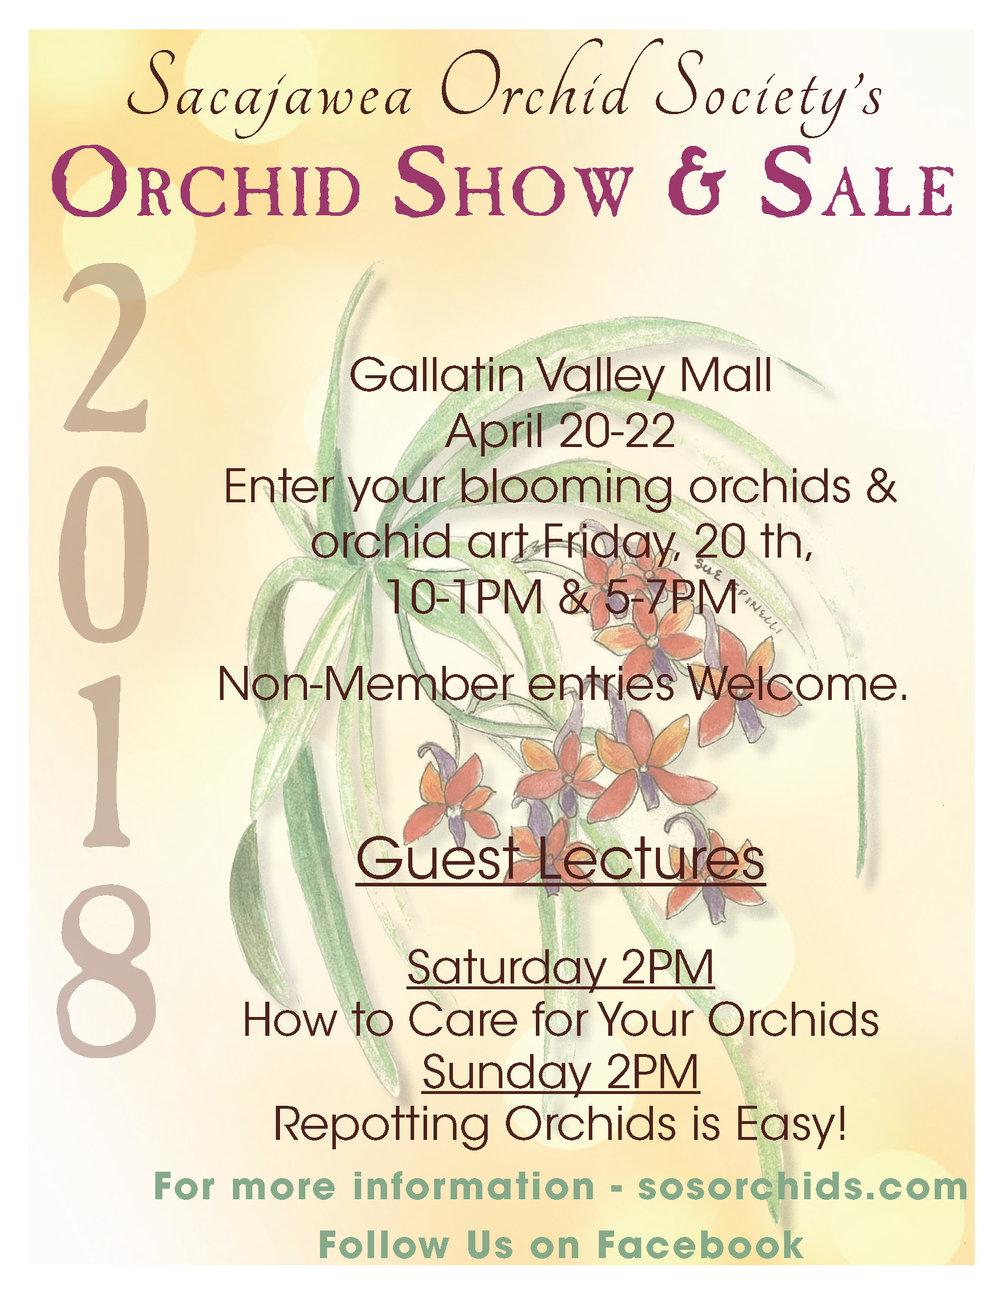 sacajawea Orchid Society flyer 2018 (1).jpg